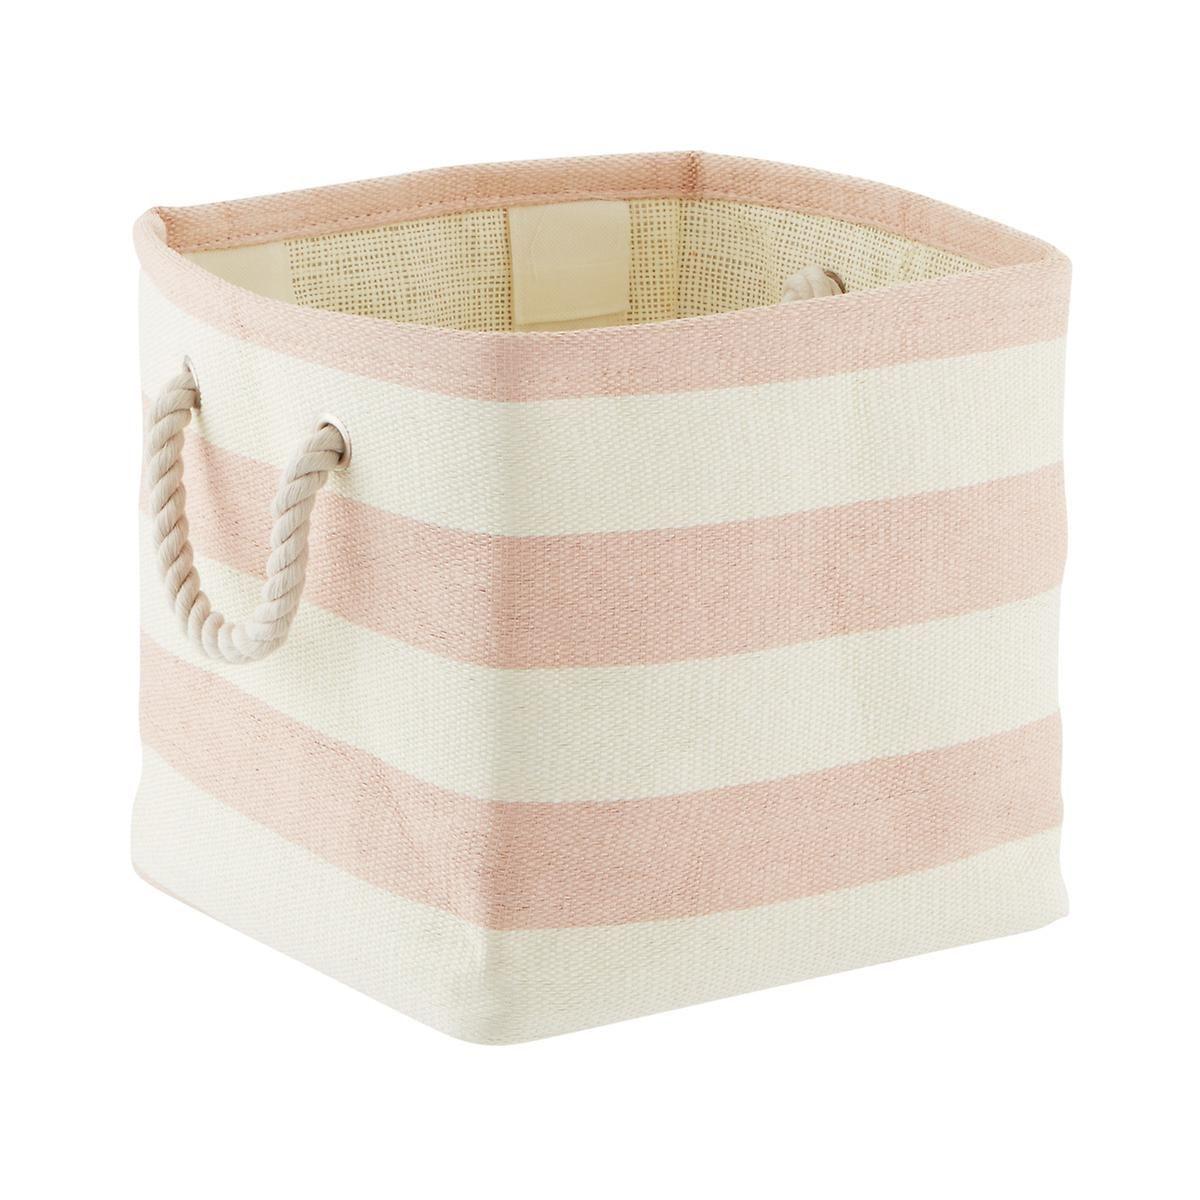 Blush Ivory Rugby Stripe Storage Cube With Rope Handles Cube Storage Fabric Storage Bins Bath Toy Storage